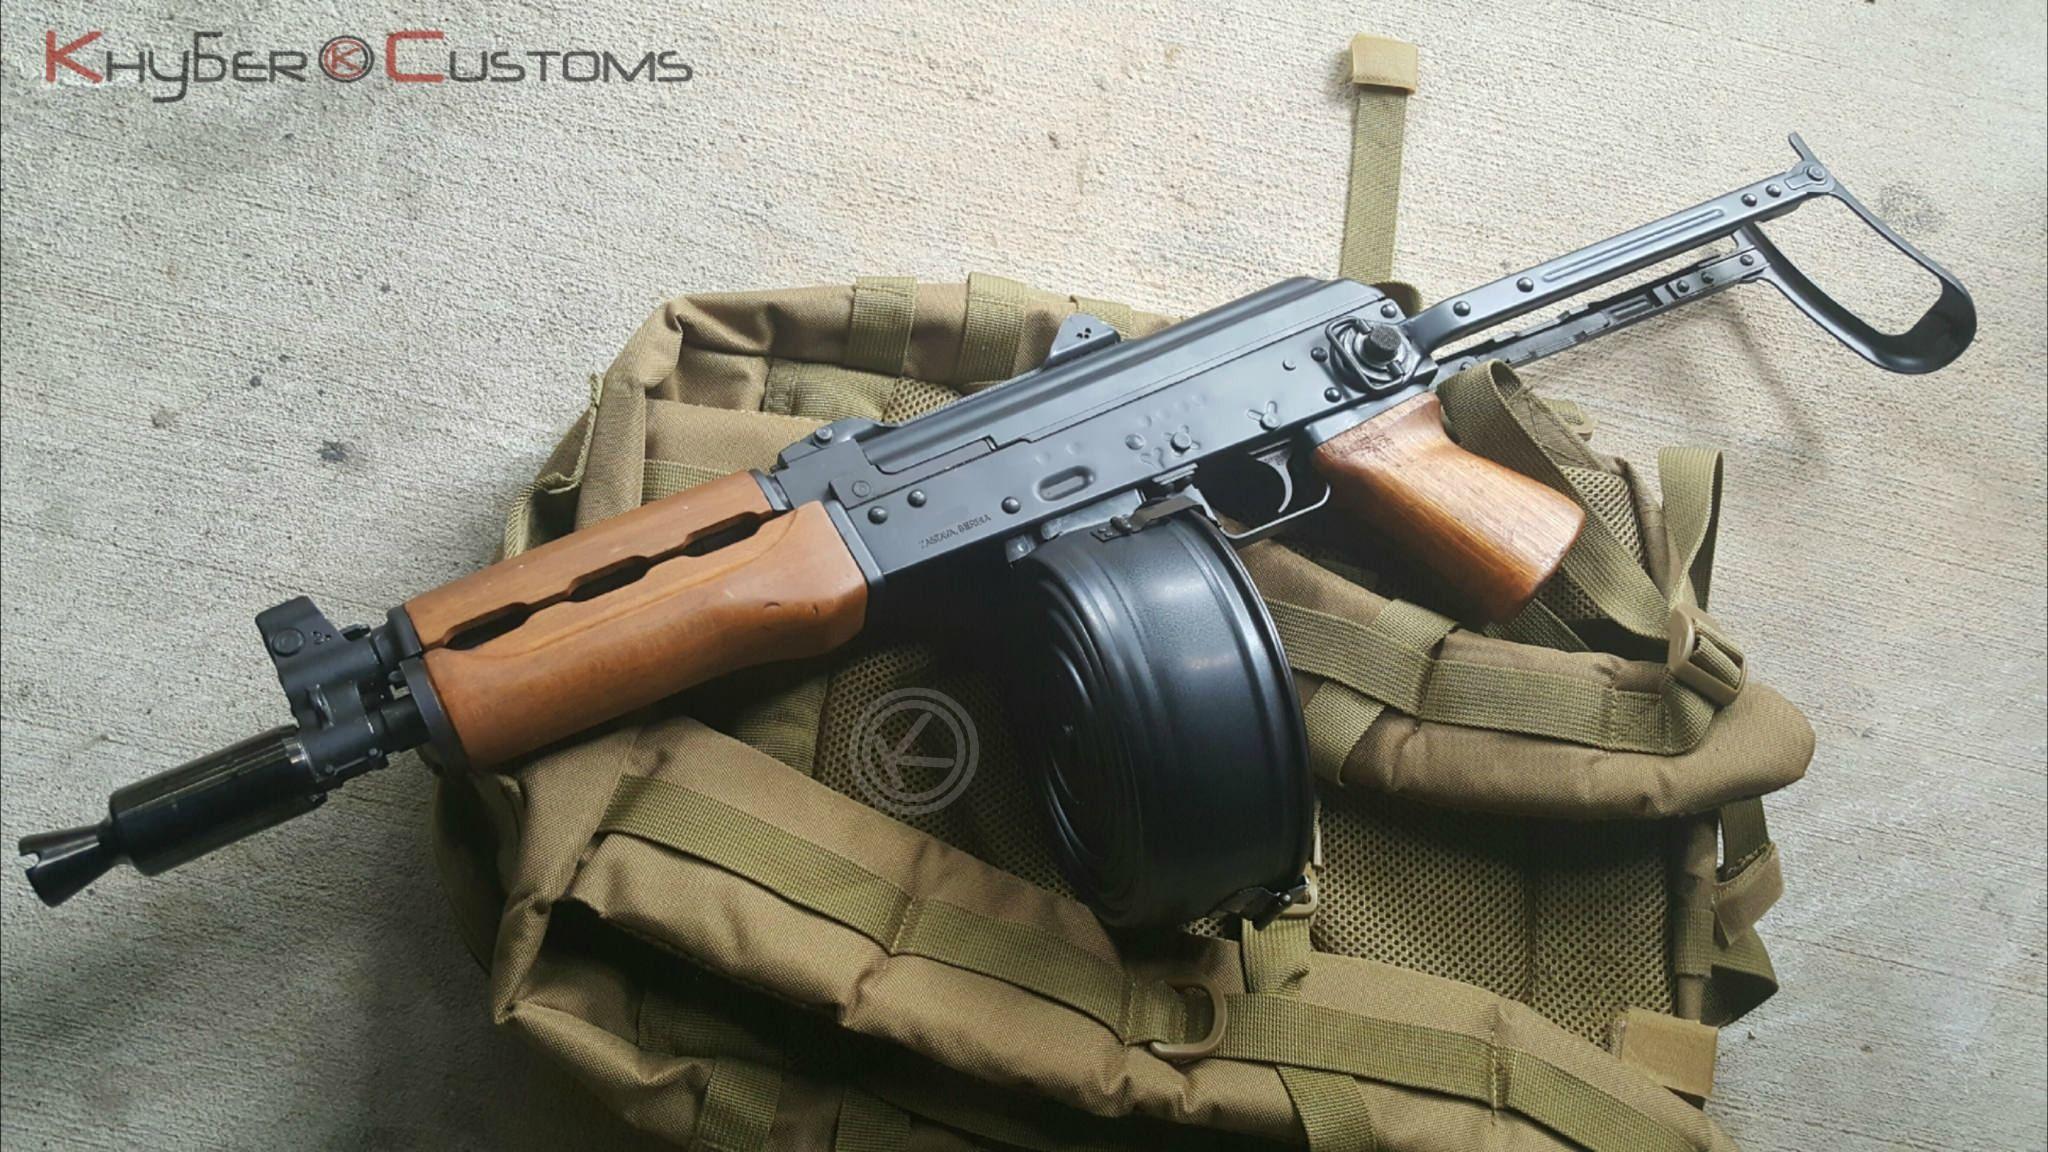 Pin by Khyber Customs on Khyber Customs   Guns